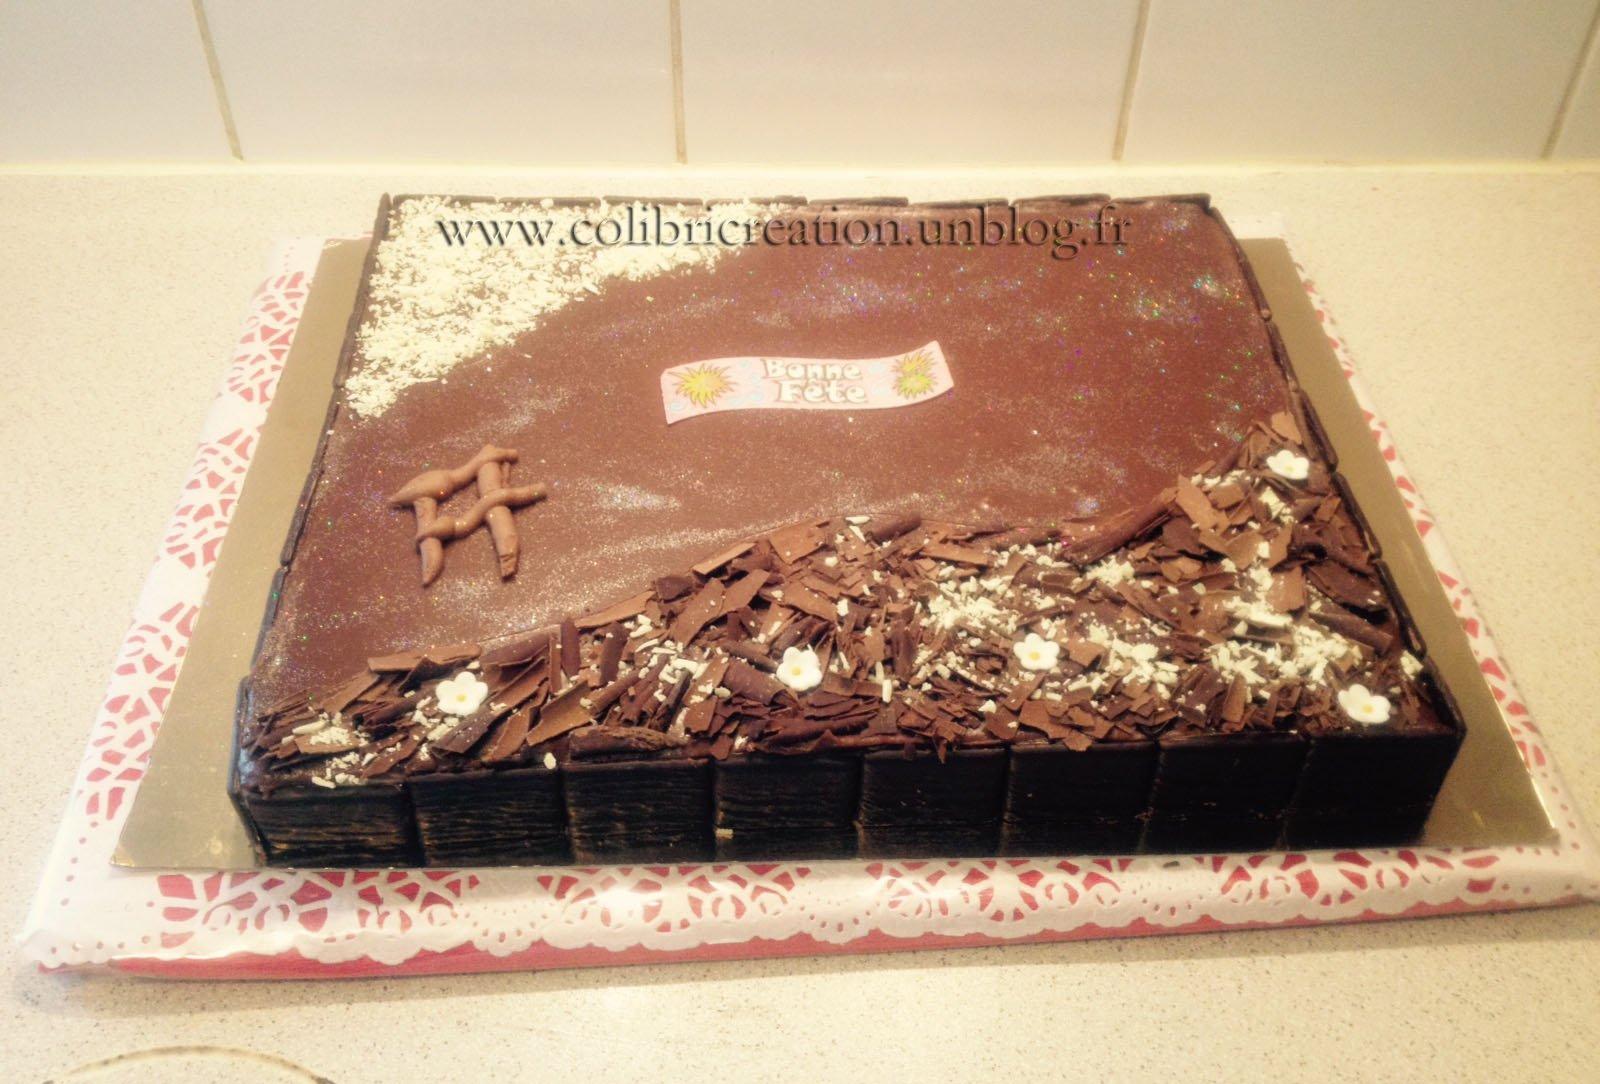 Gateaux chocolat 2015